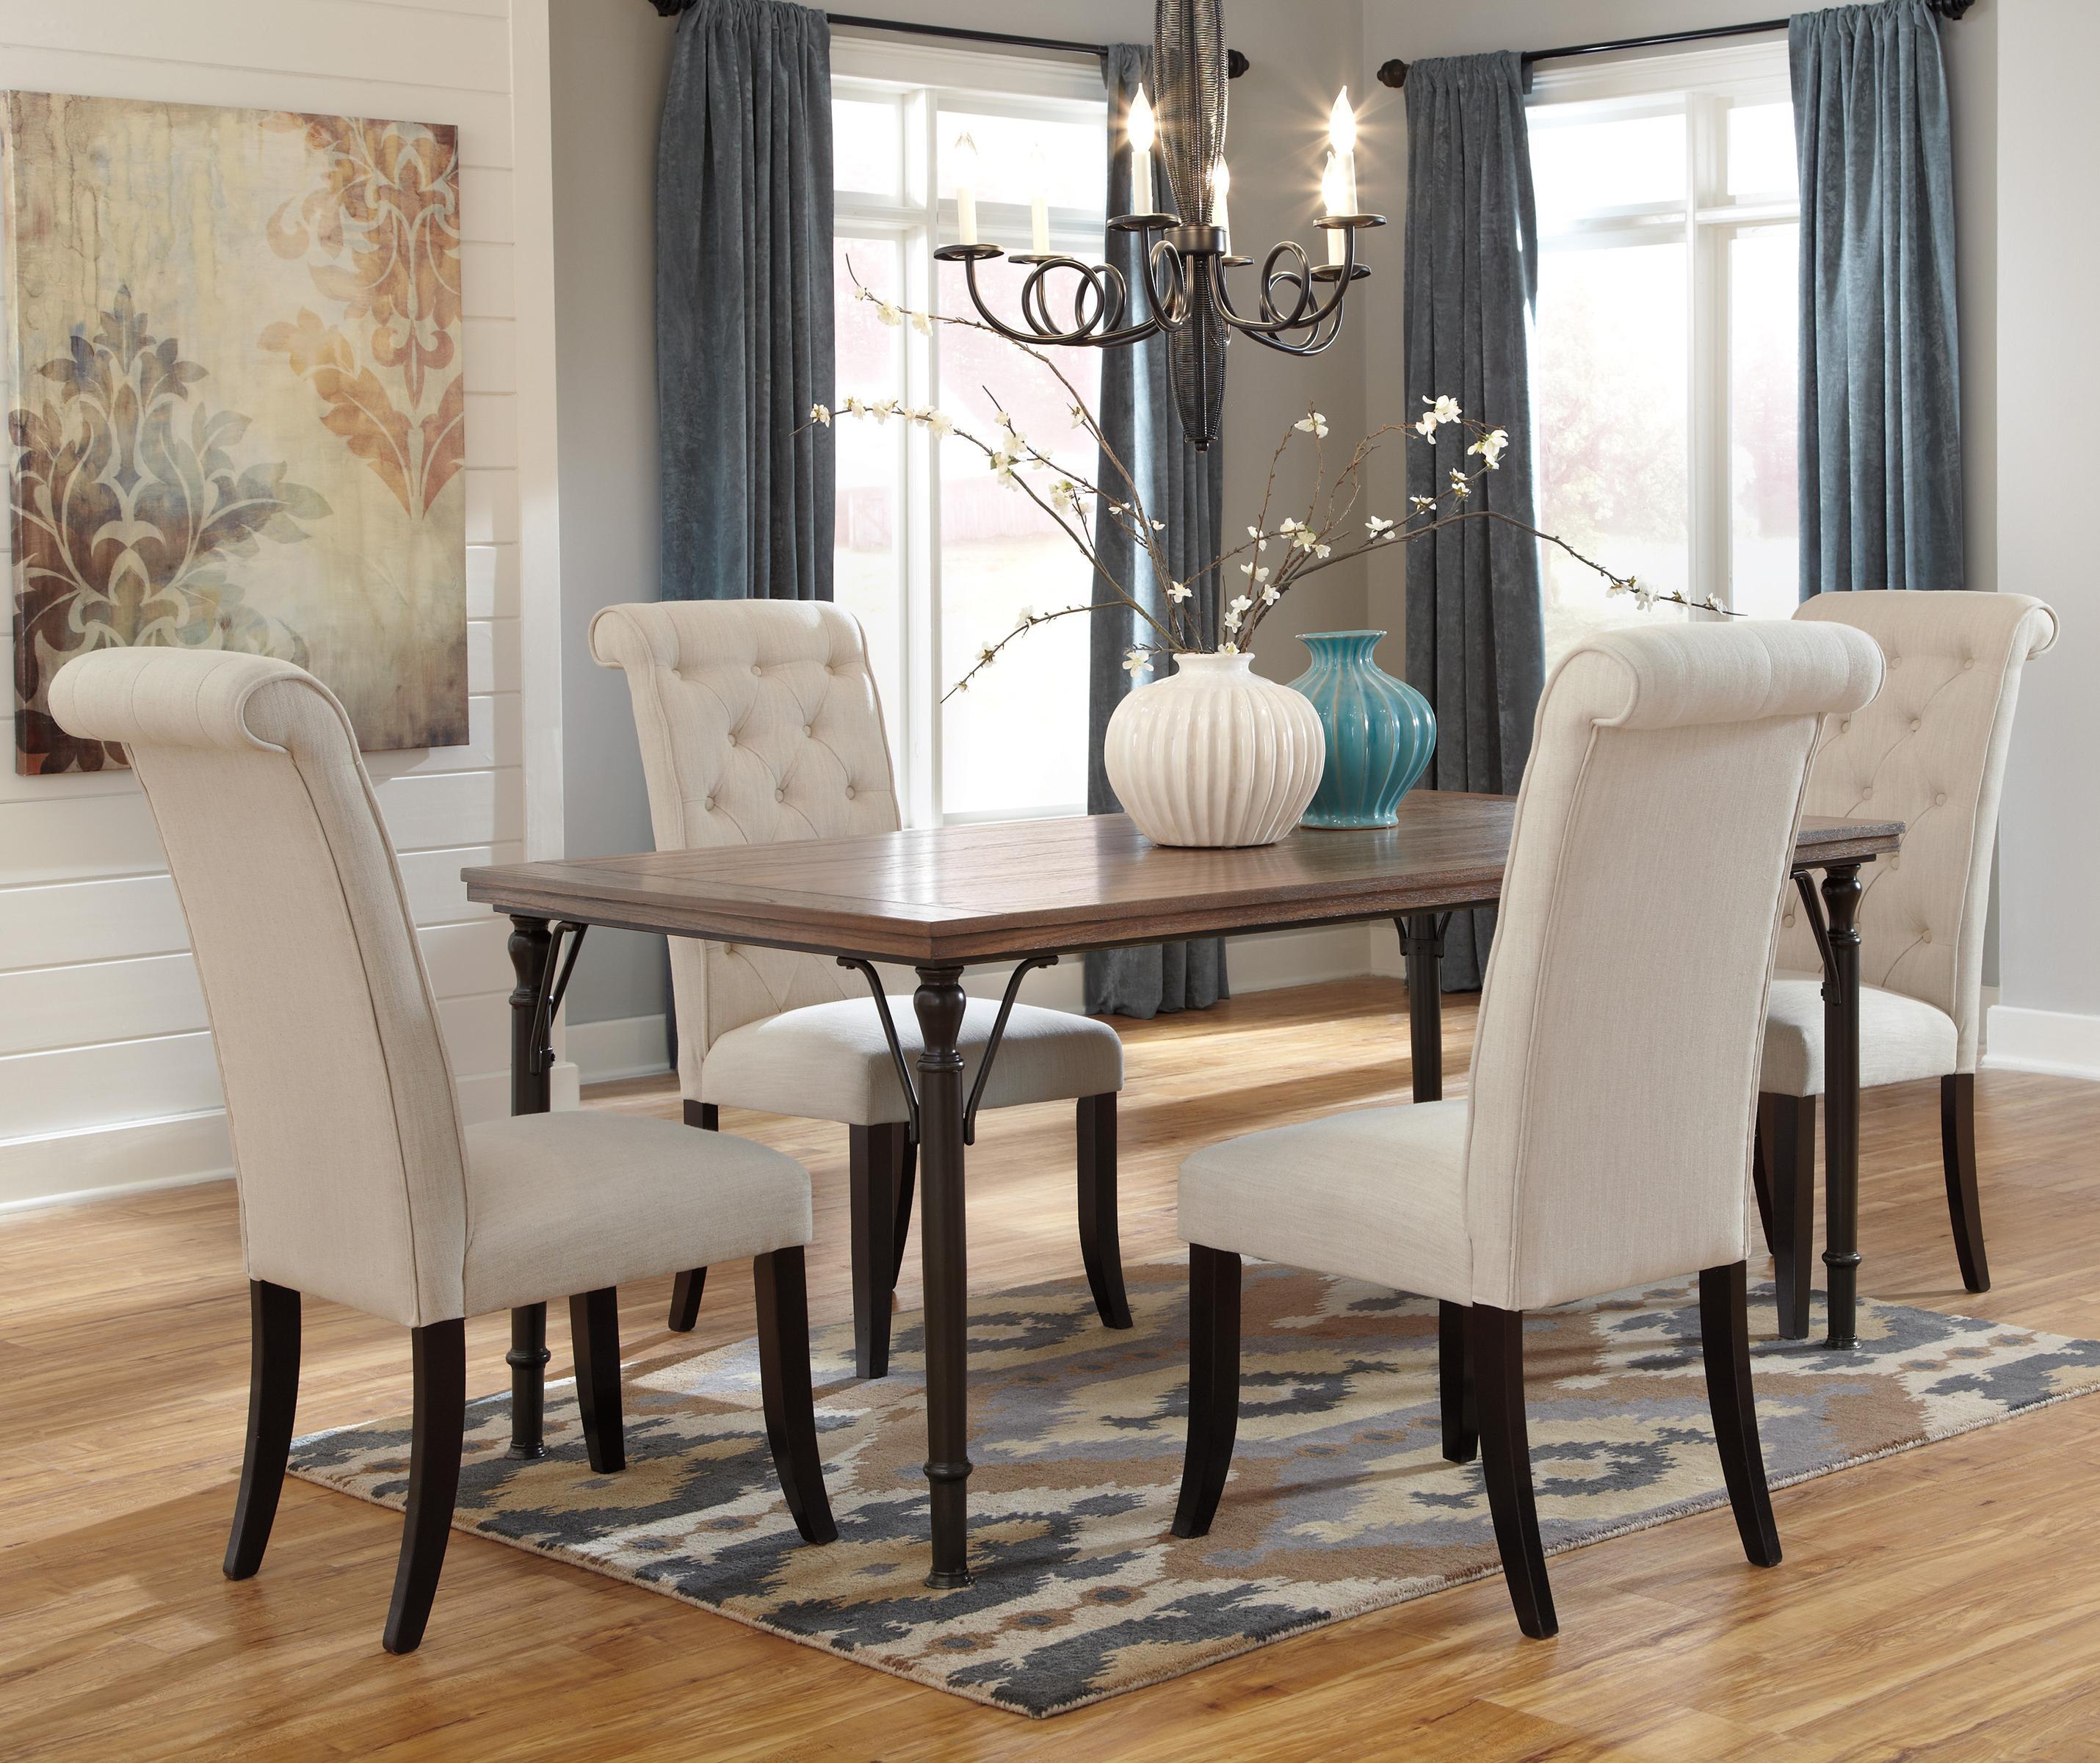 Awesome Ashley Signature Design Tripton 5 Piece Rectangular Dining Room Table Set  W/ Wood Top U0026 Metal Legs   Dunk U0026 Bright Furniture   Dining 5 Piece Sets Part 10